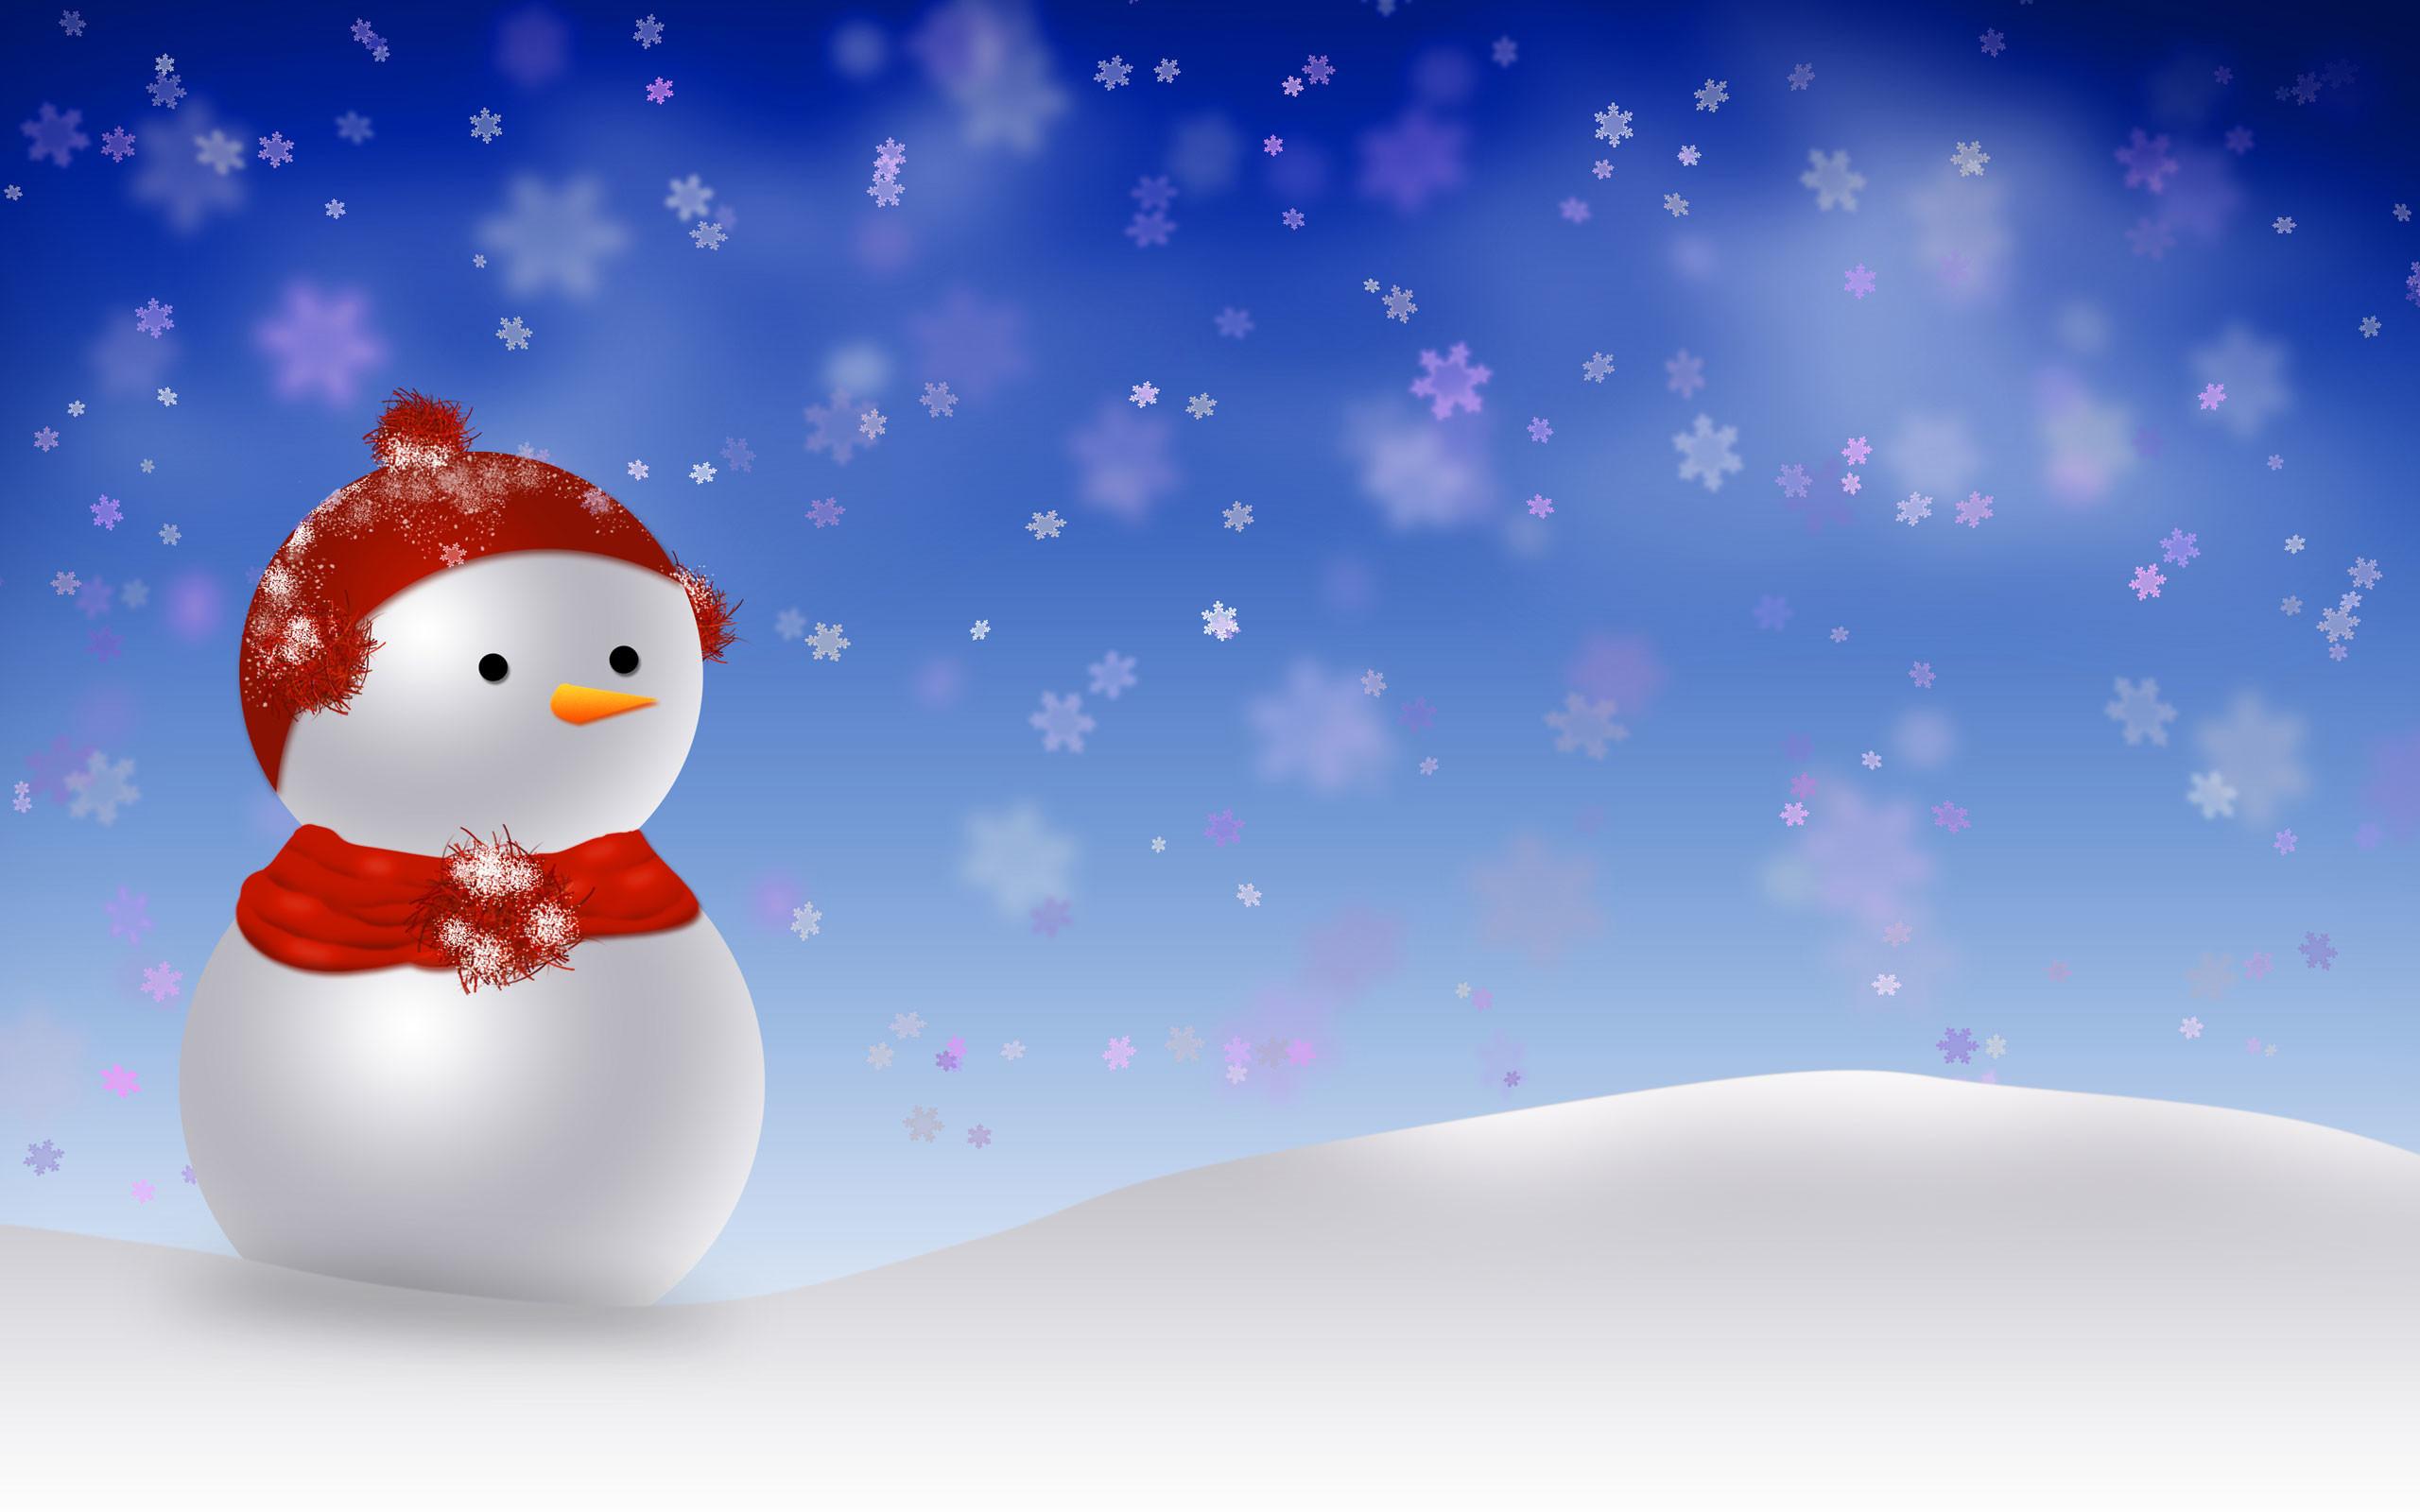 Cute Christmas Backgrounds | Free Cute Christmas Desktop Backgrounds .